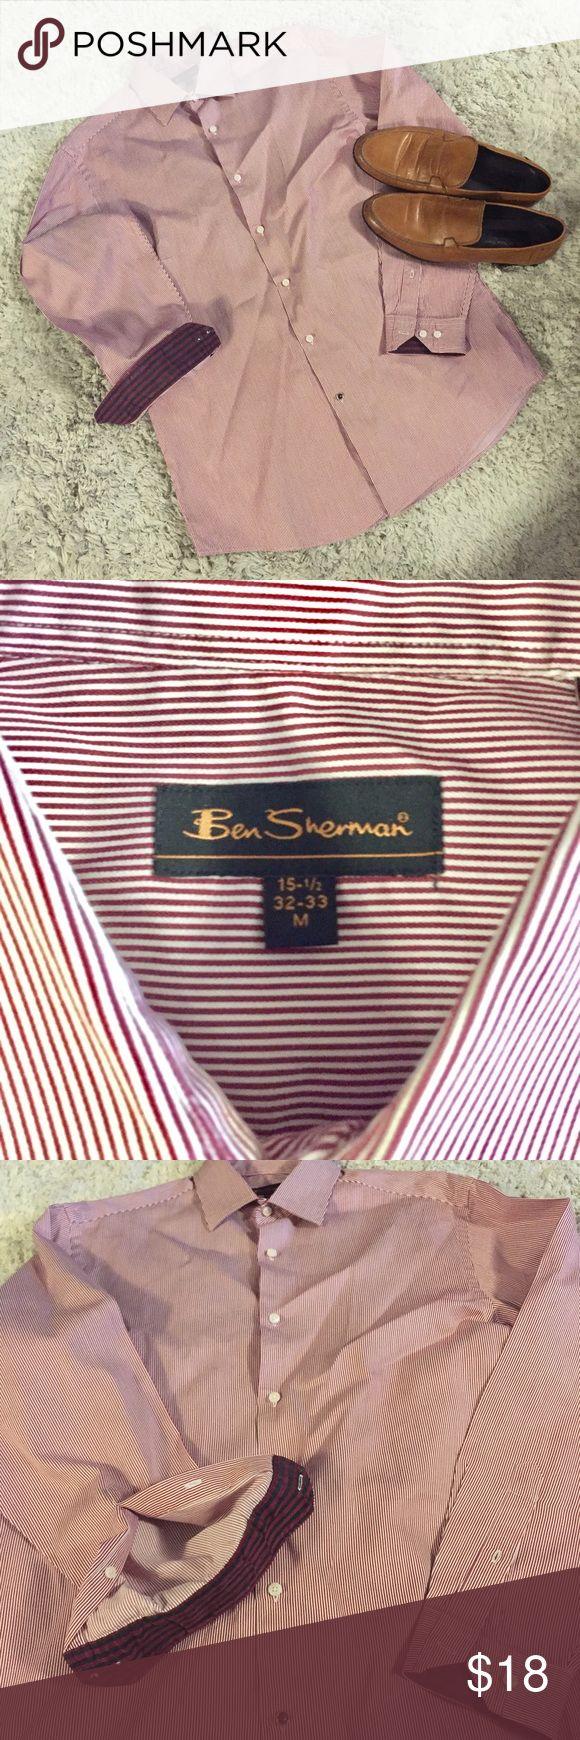 BEN SHERMAN - button down dress shirt Vertical red and salmon stripes. Ben Sherman Shirts Dress Shirts